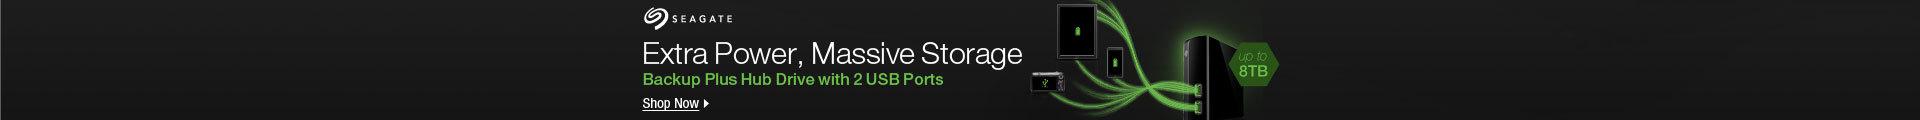 Extra Power, Massive Storage